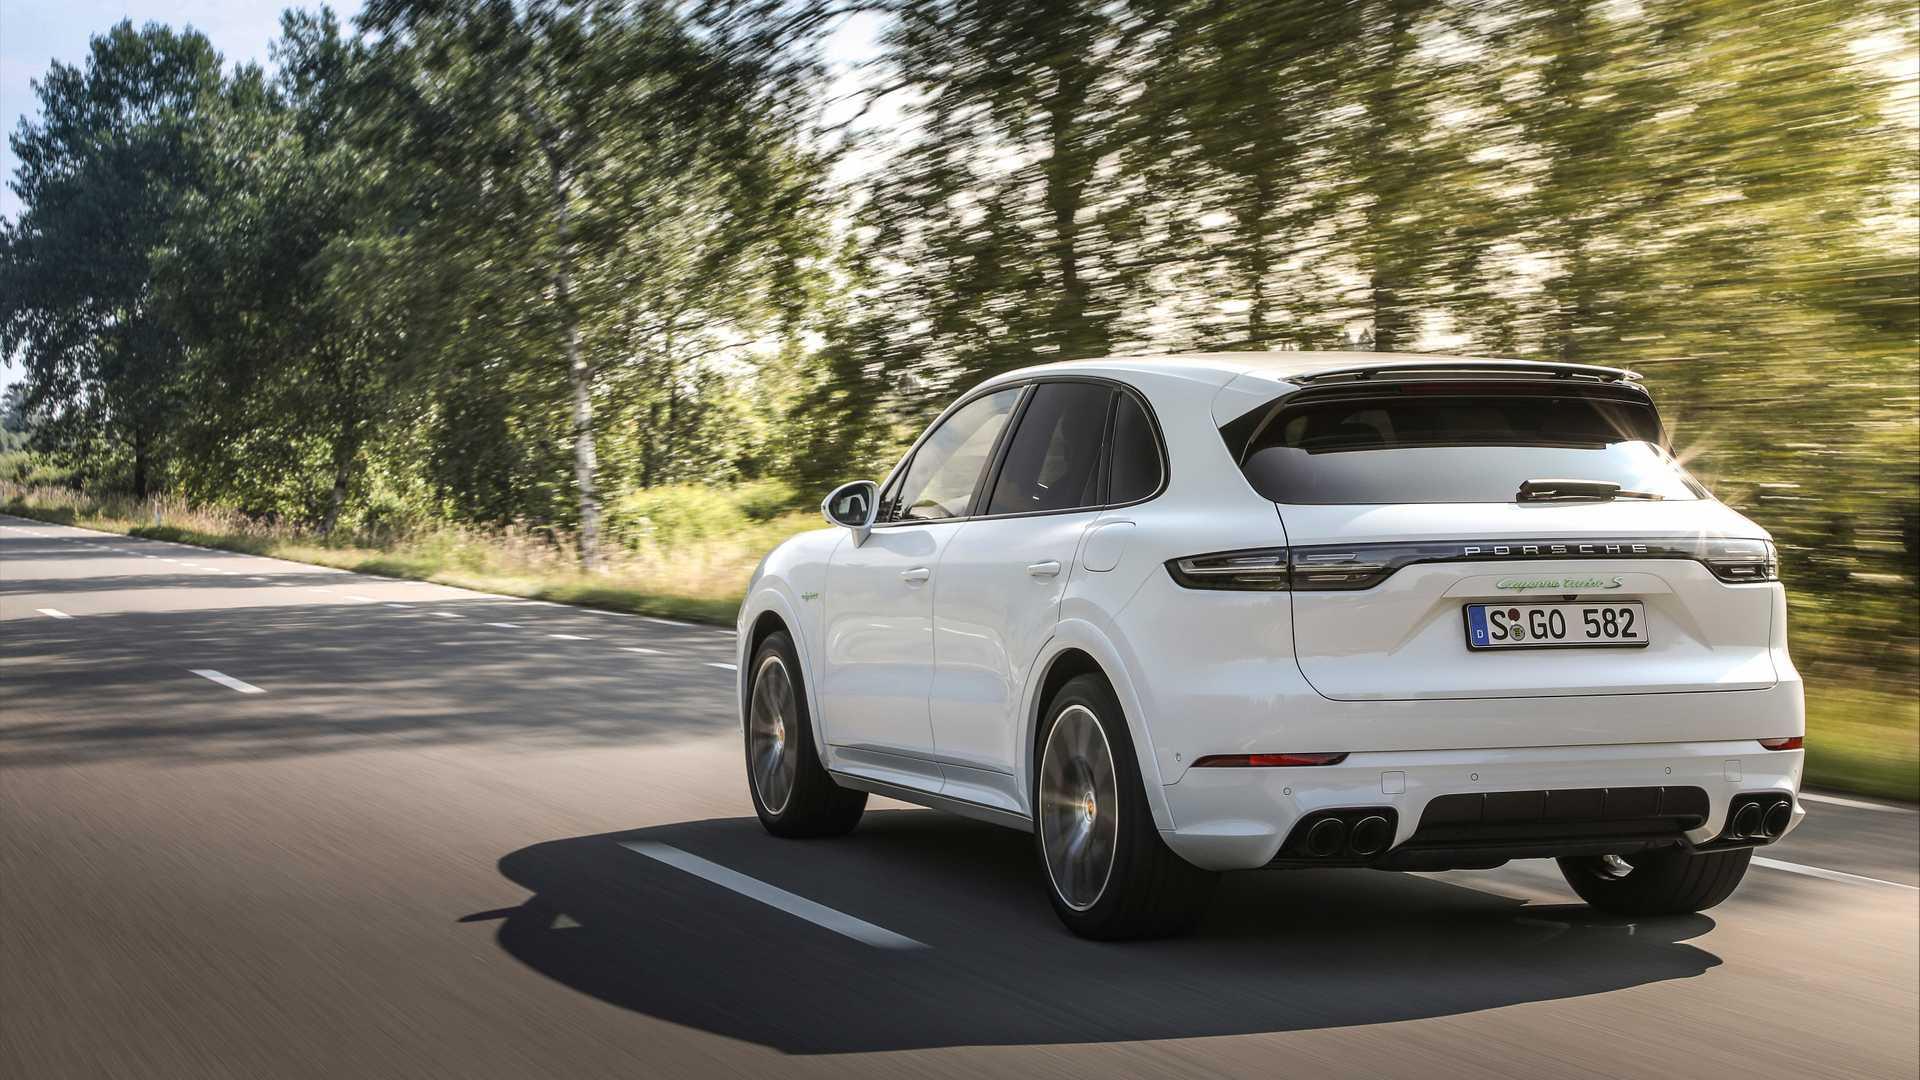 2020-porsche-cayenne-turbo-s-e-hybrid-coupe-turbo-s-e-hybrid-and-coupe-e-hybrid-3